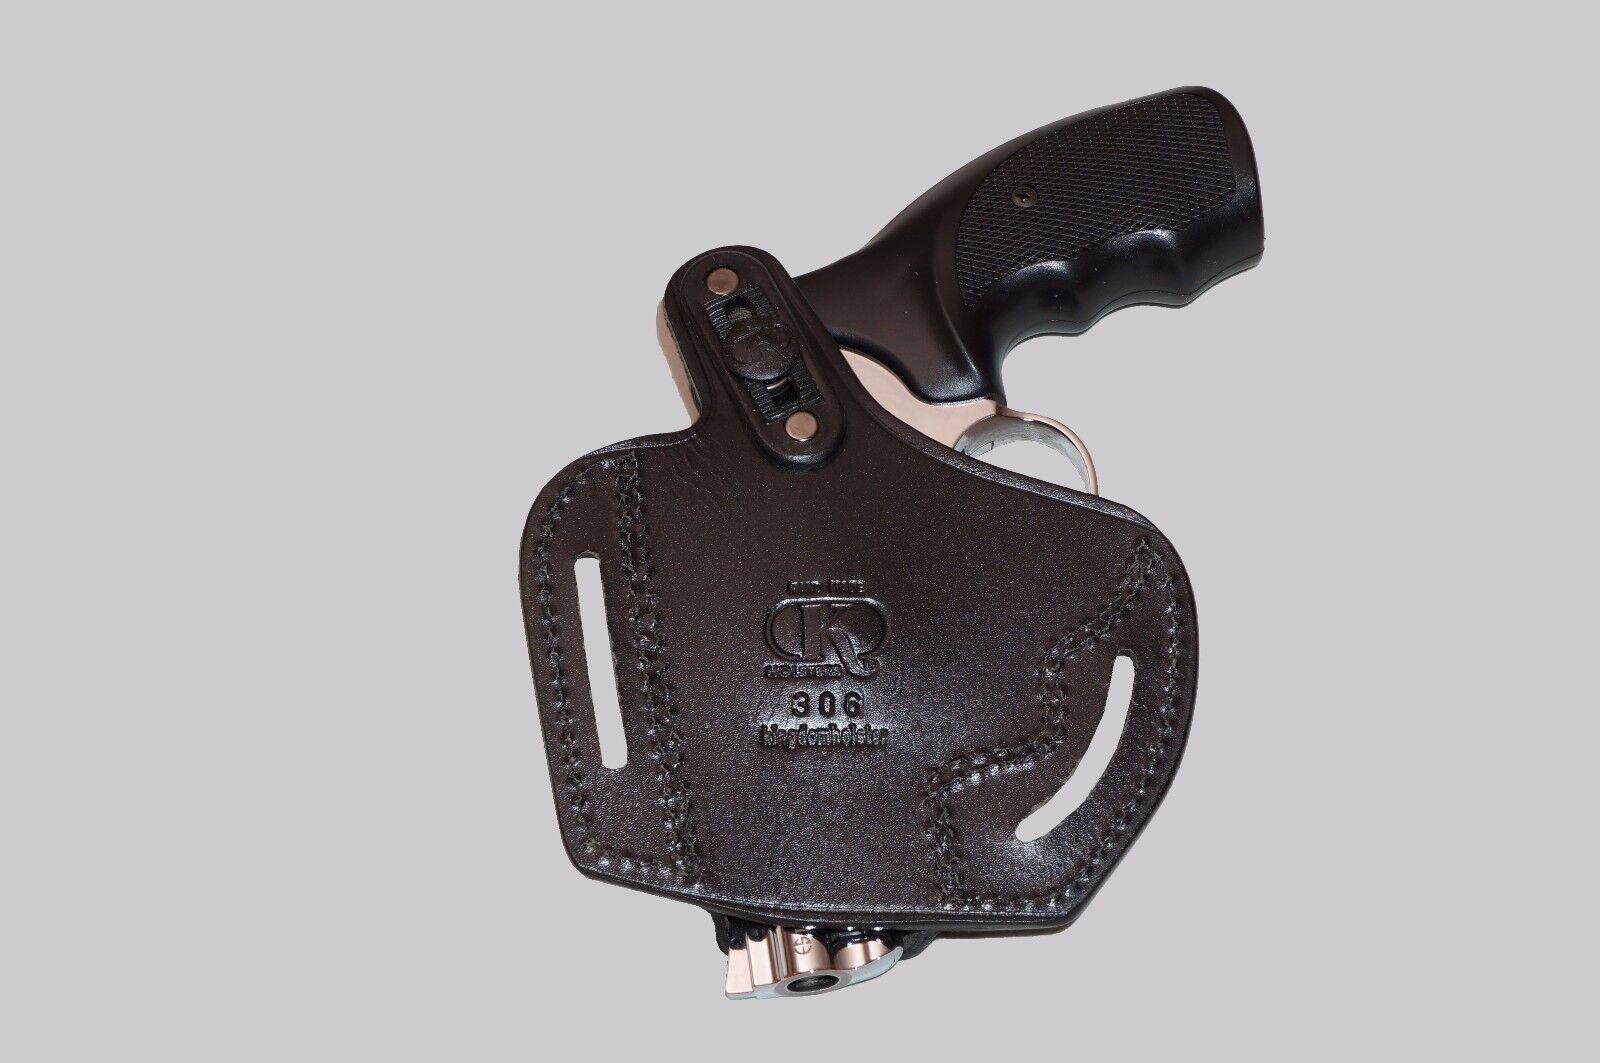 K30637-357 Pancake Holster Open-end RH & Single Single Single Speedloader Case For 357 Magnum 6ced2b